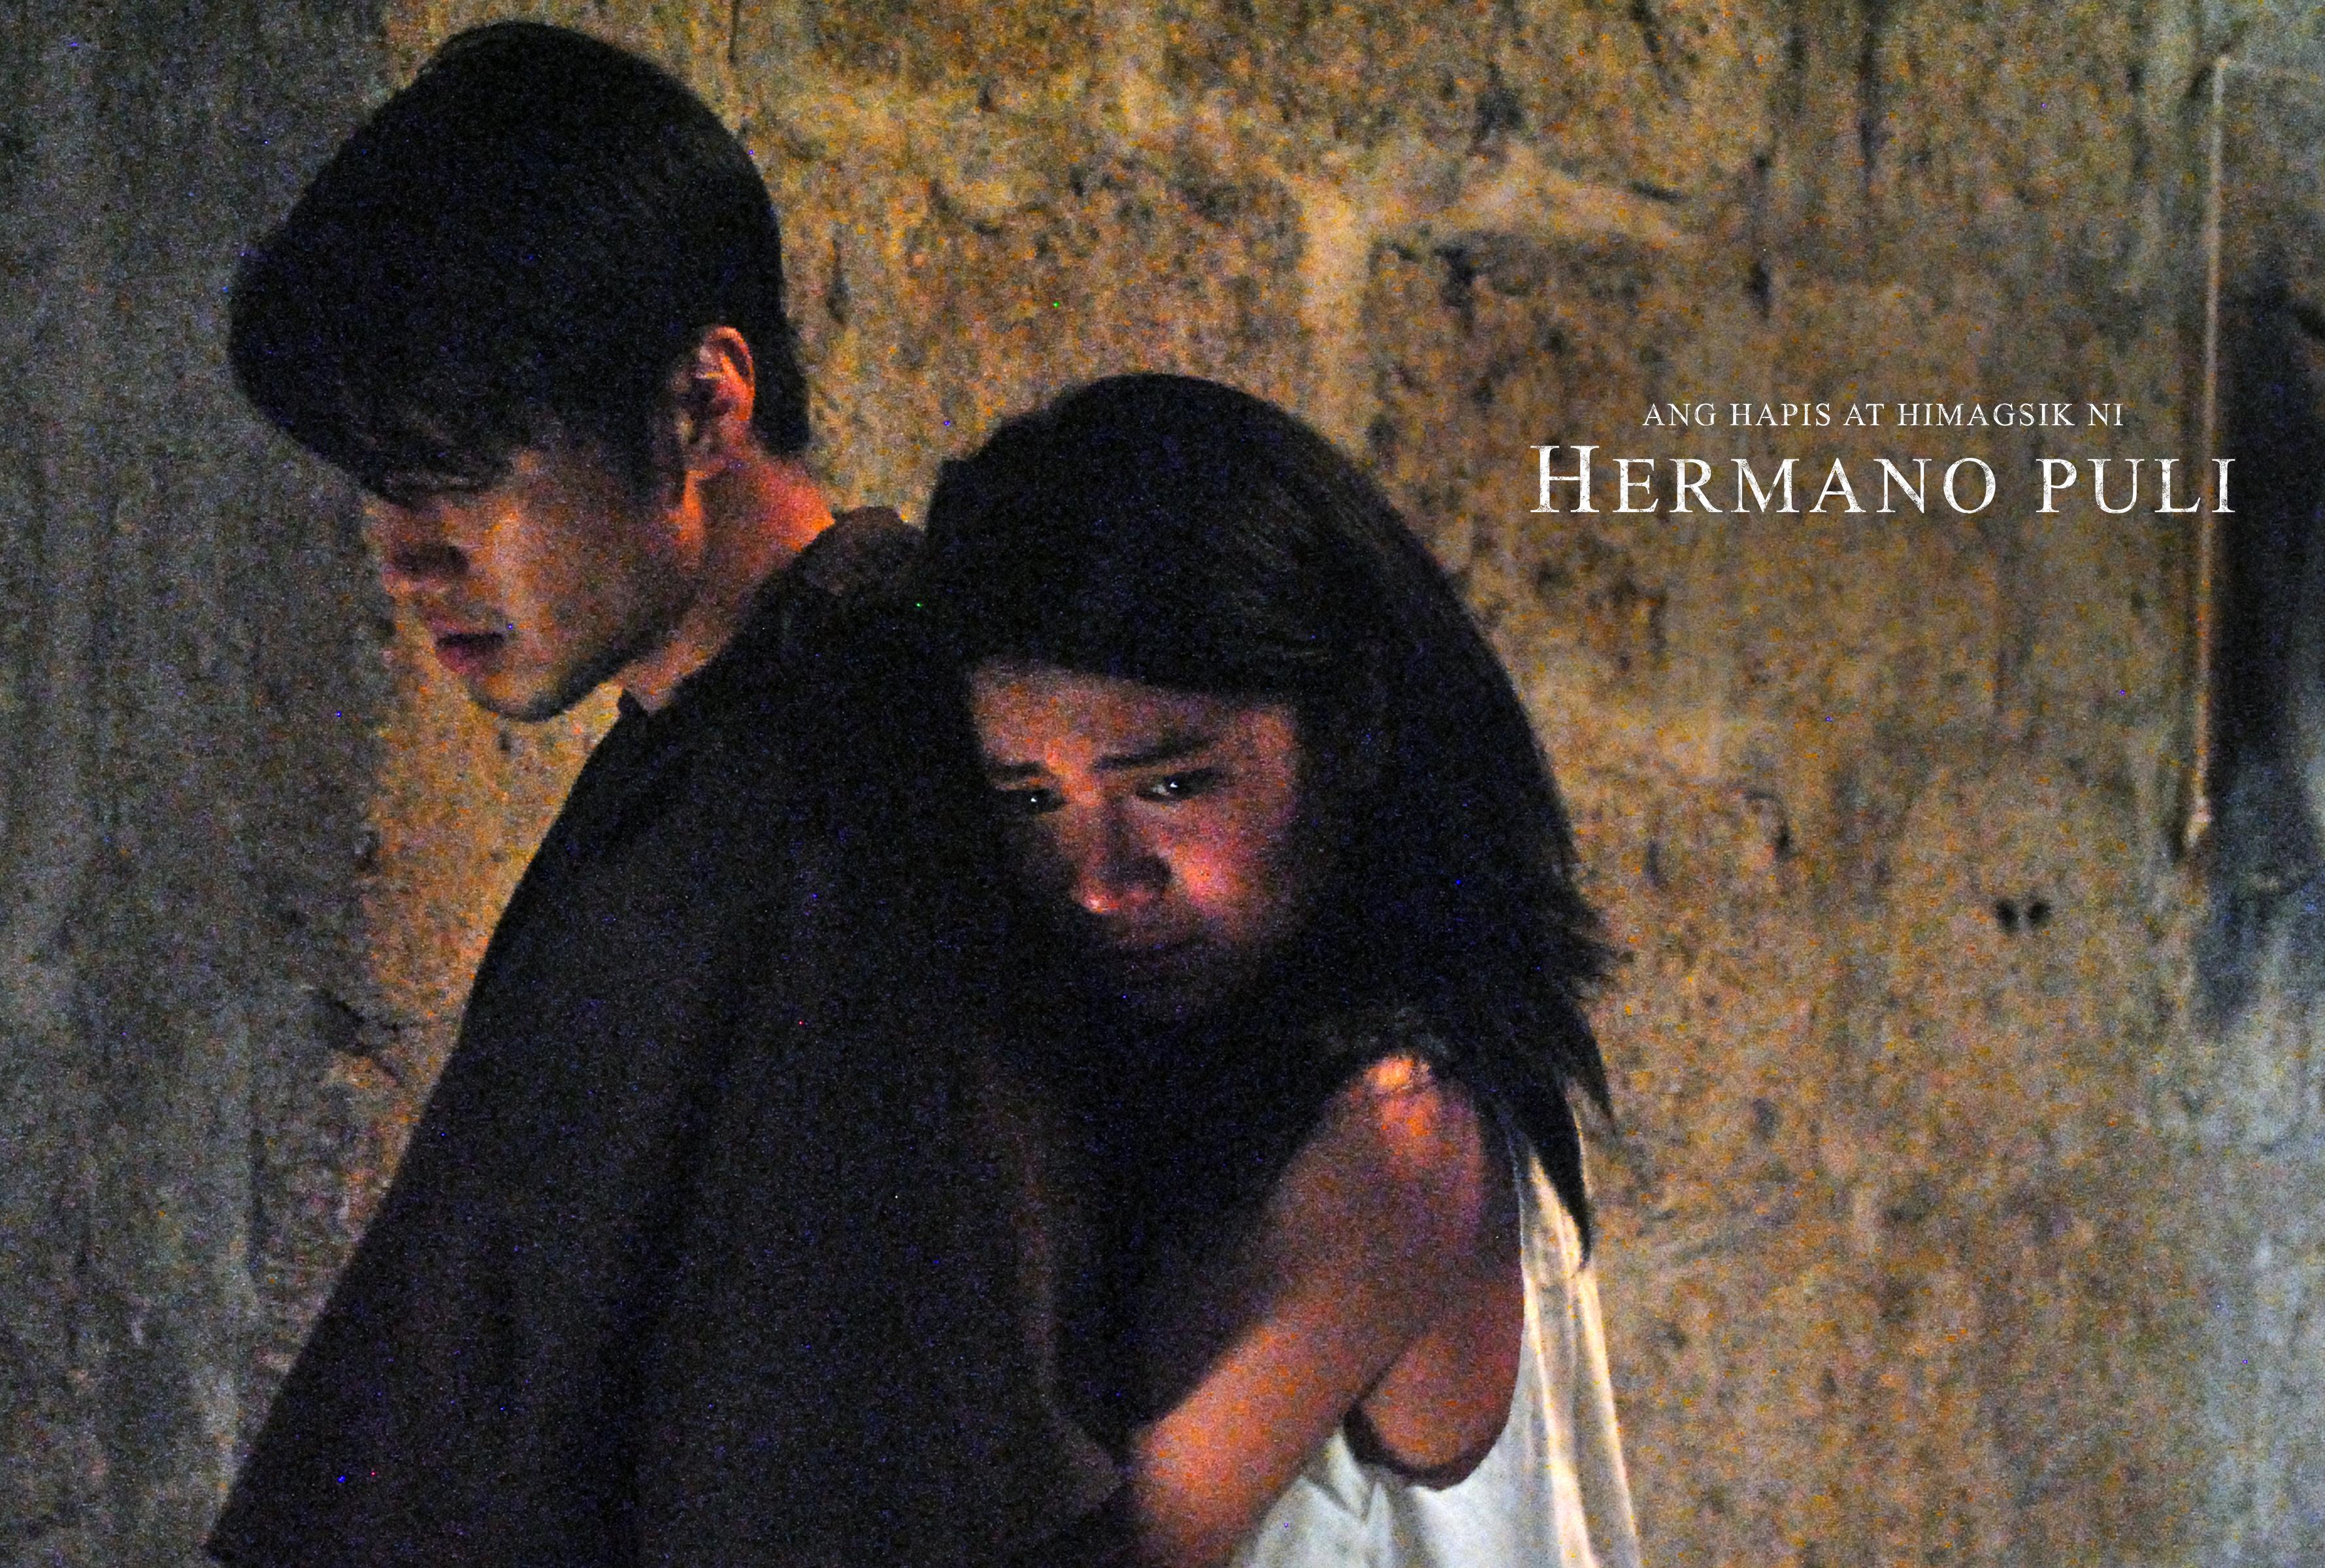 Hermana Lina tests Hermano Puli's vow of chastity.